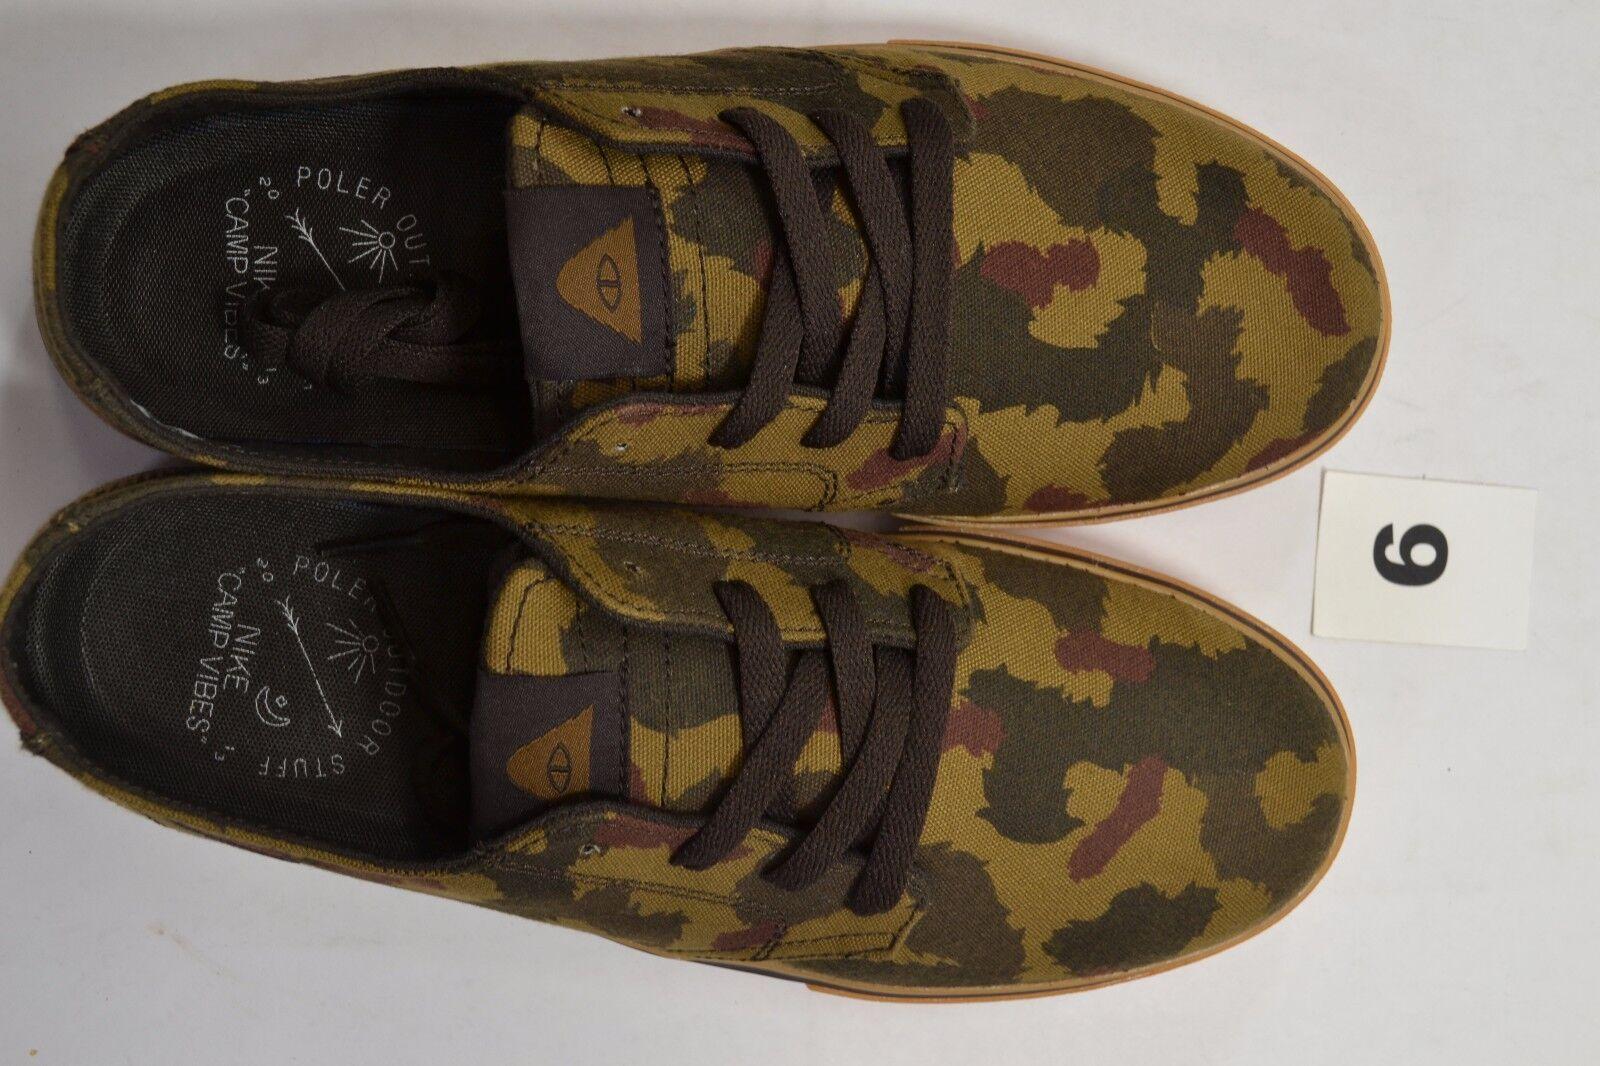 c944cfda0e70 ... Nike BRAATA LR POLER Velvet Brown Brown Brown Military Brown Discounted  (315) Men s Shoes ...